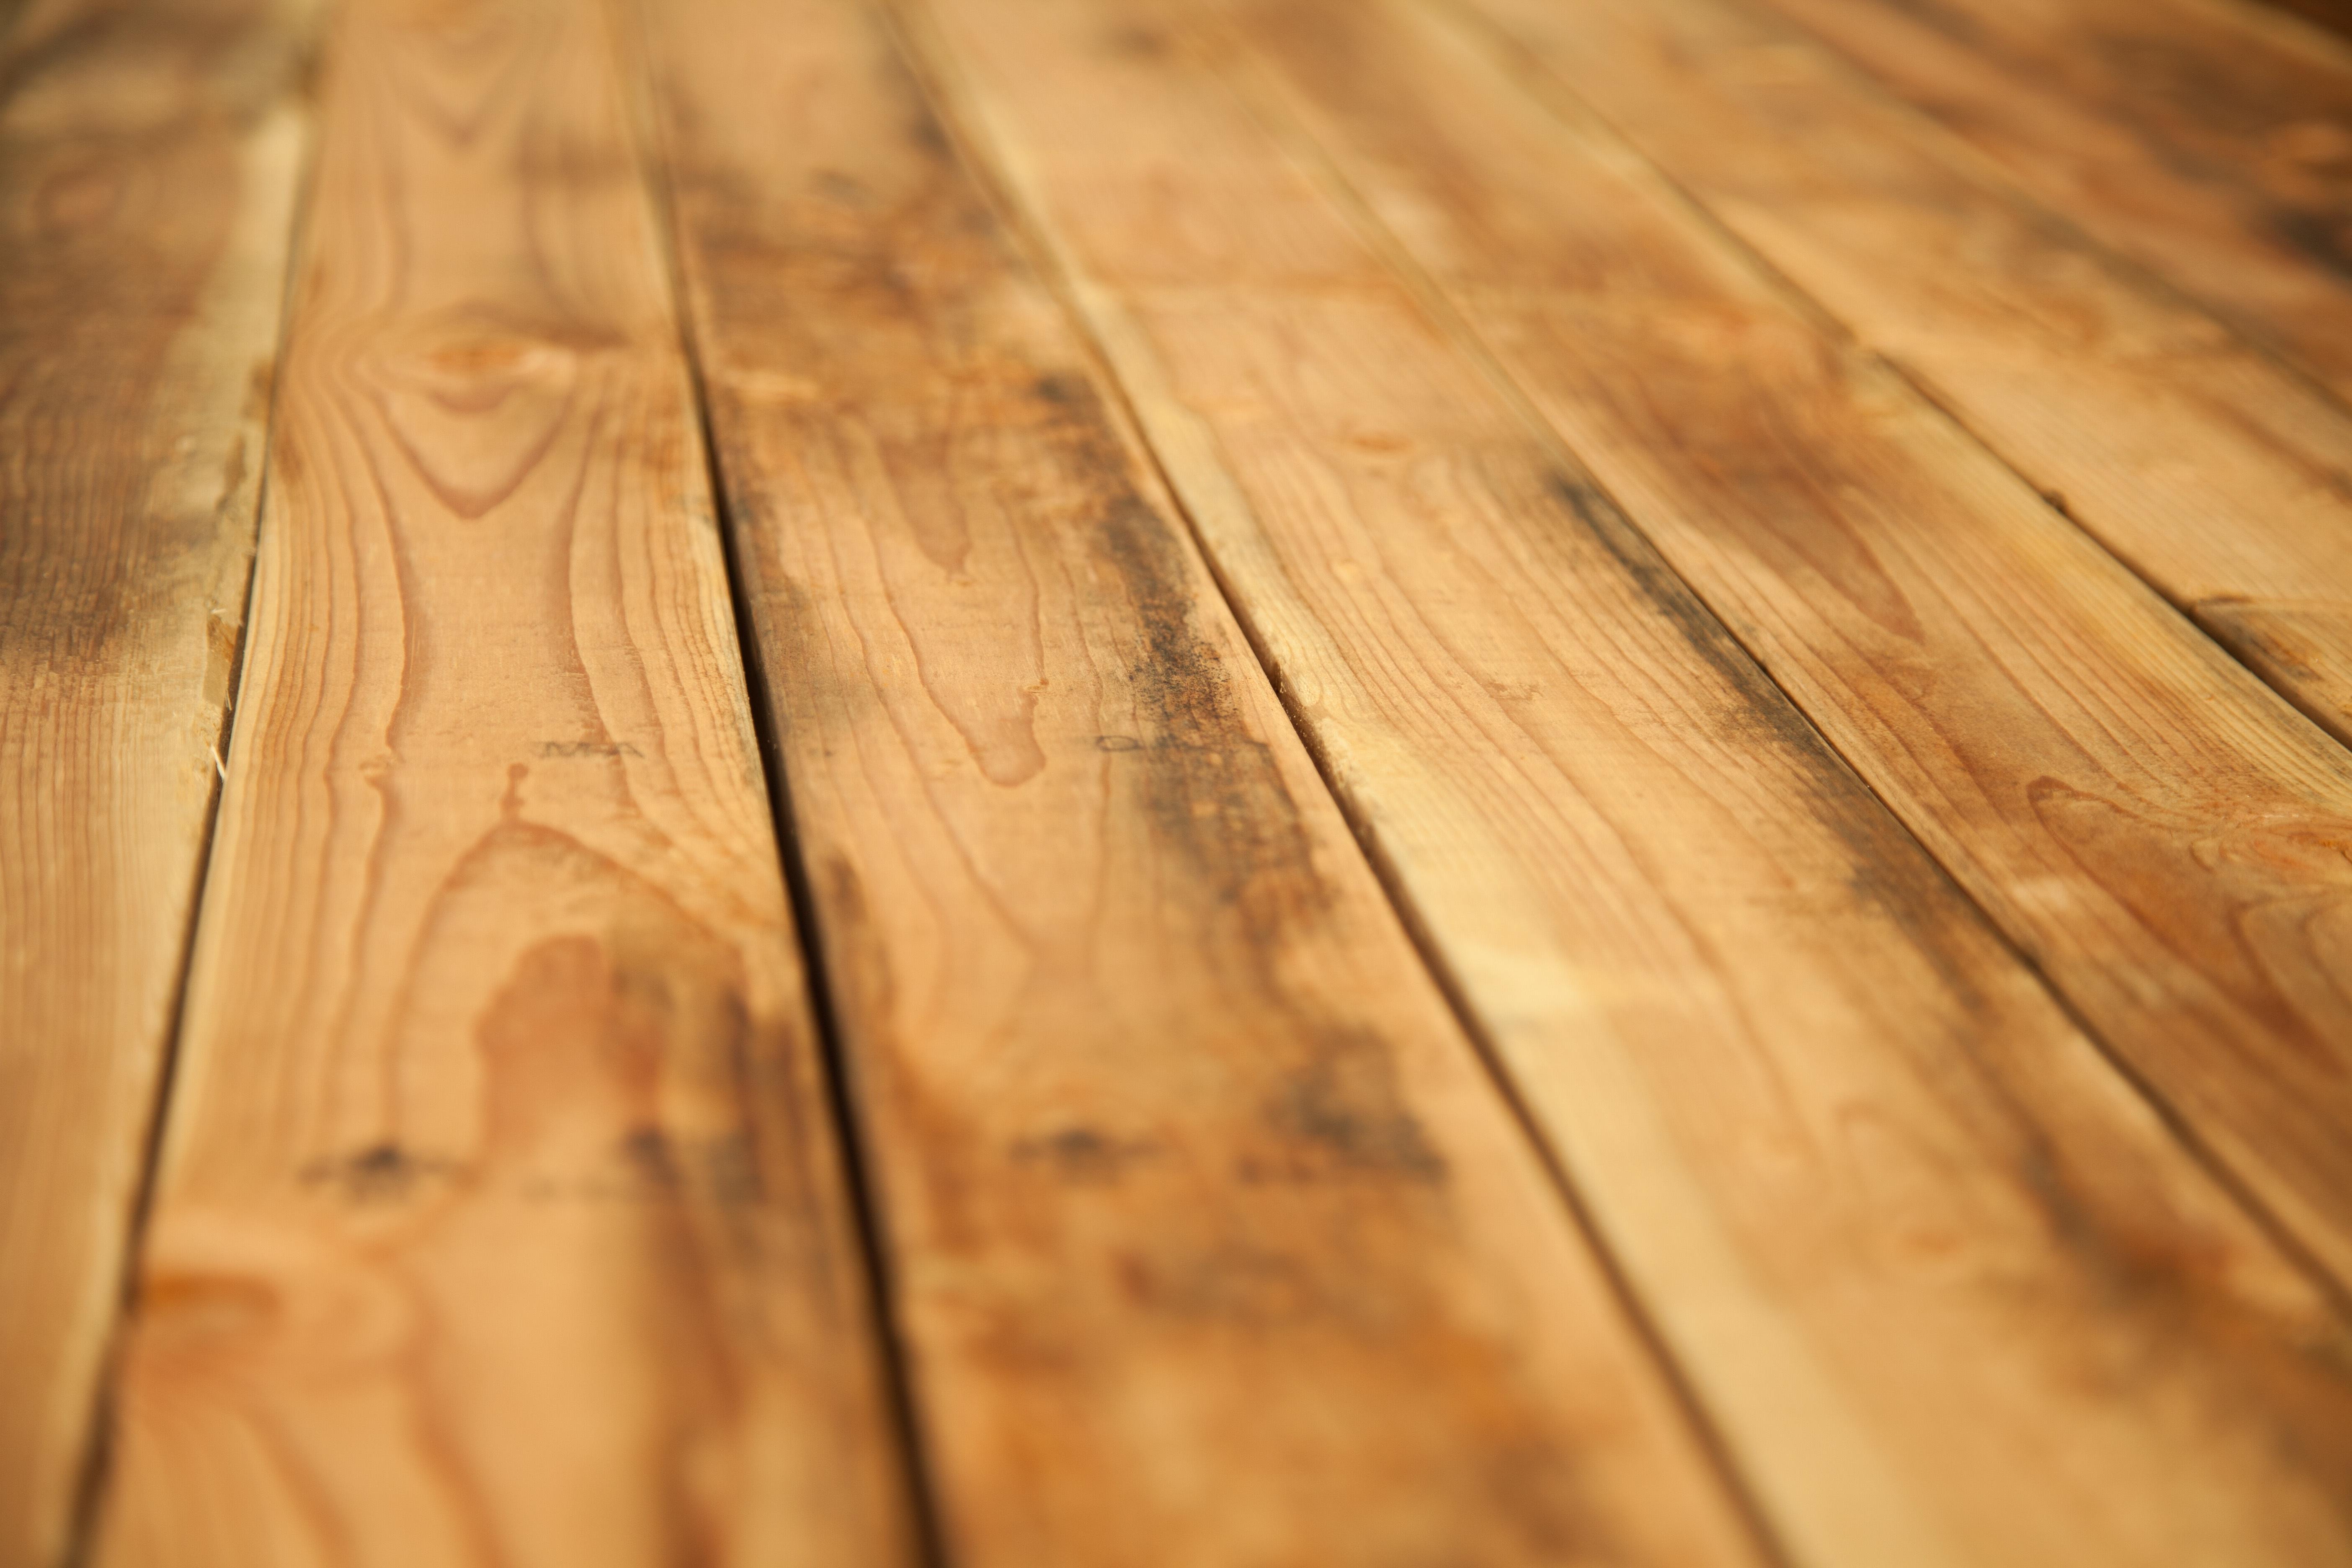 Free Images Plank Floor Produce Lumber Hardwood